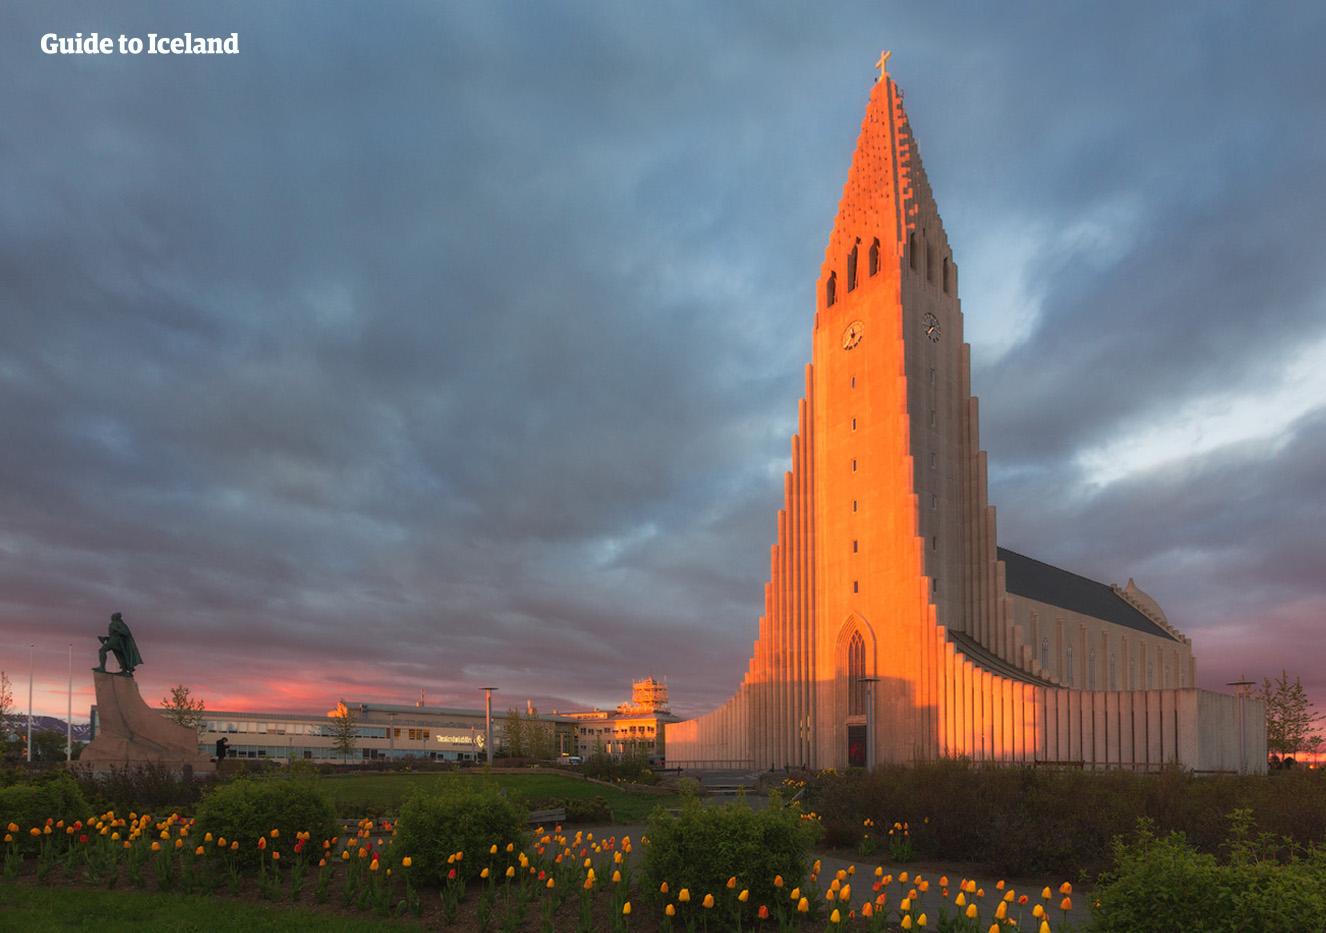 De majestueuze Hallgrímskirkja-kerk in Reykjavík baadt in de warme gloed van de middernachtzon